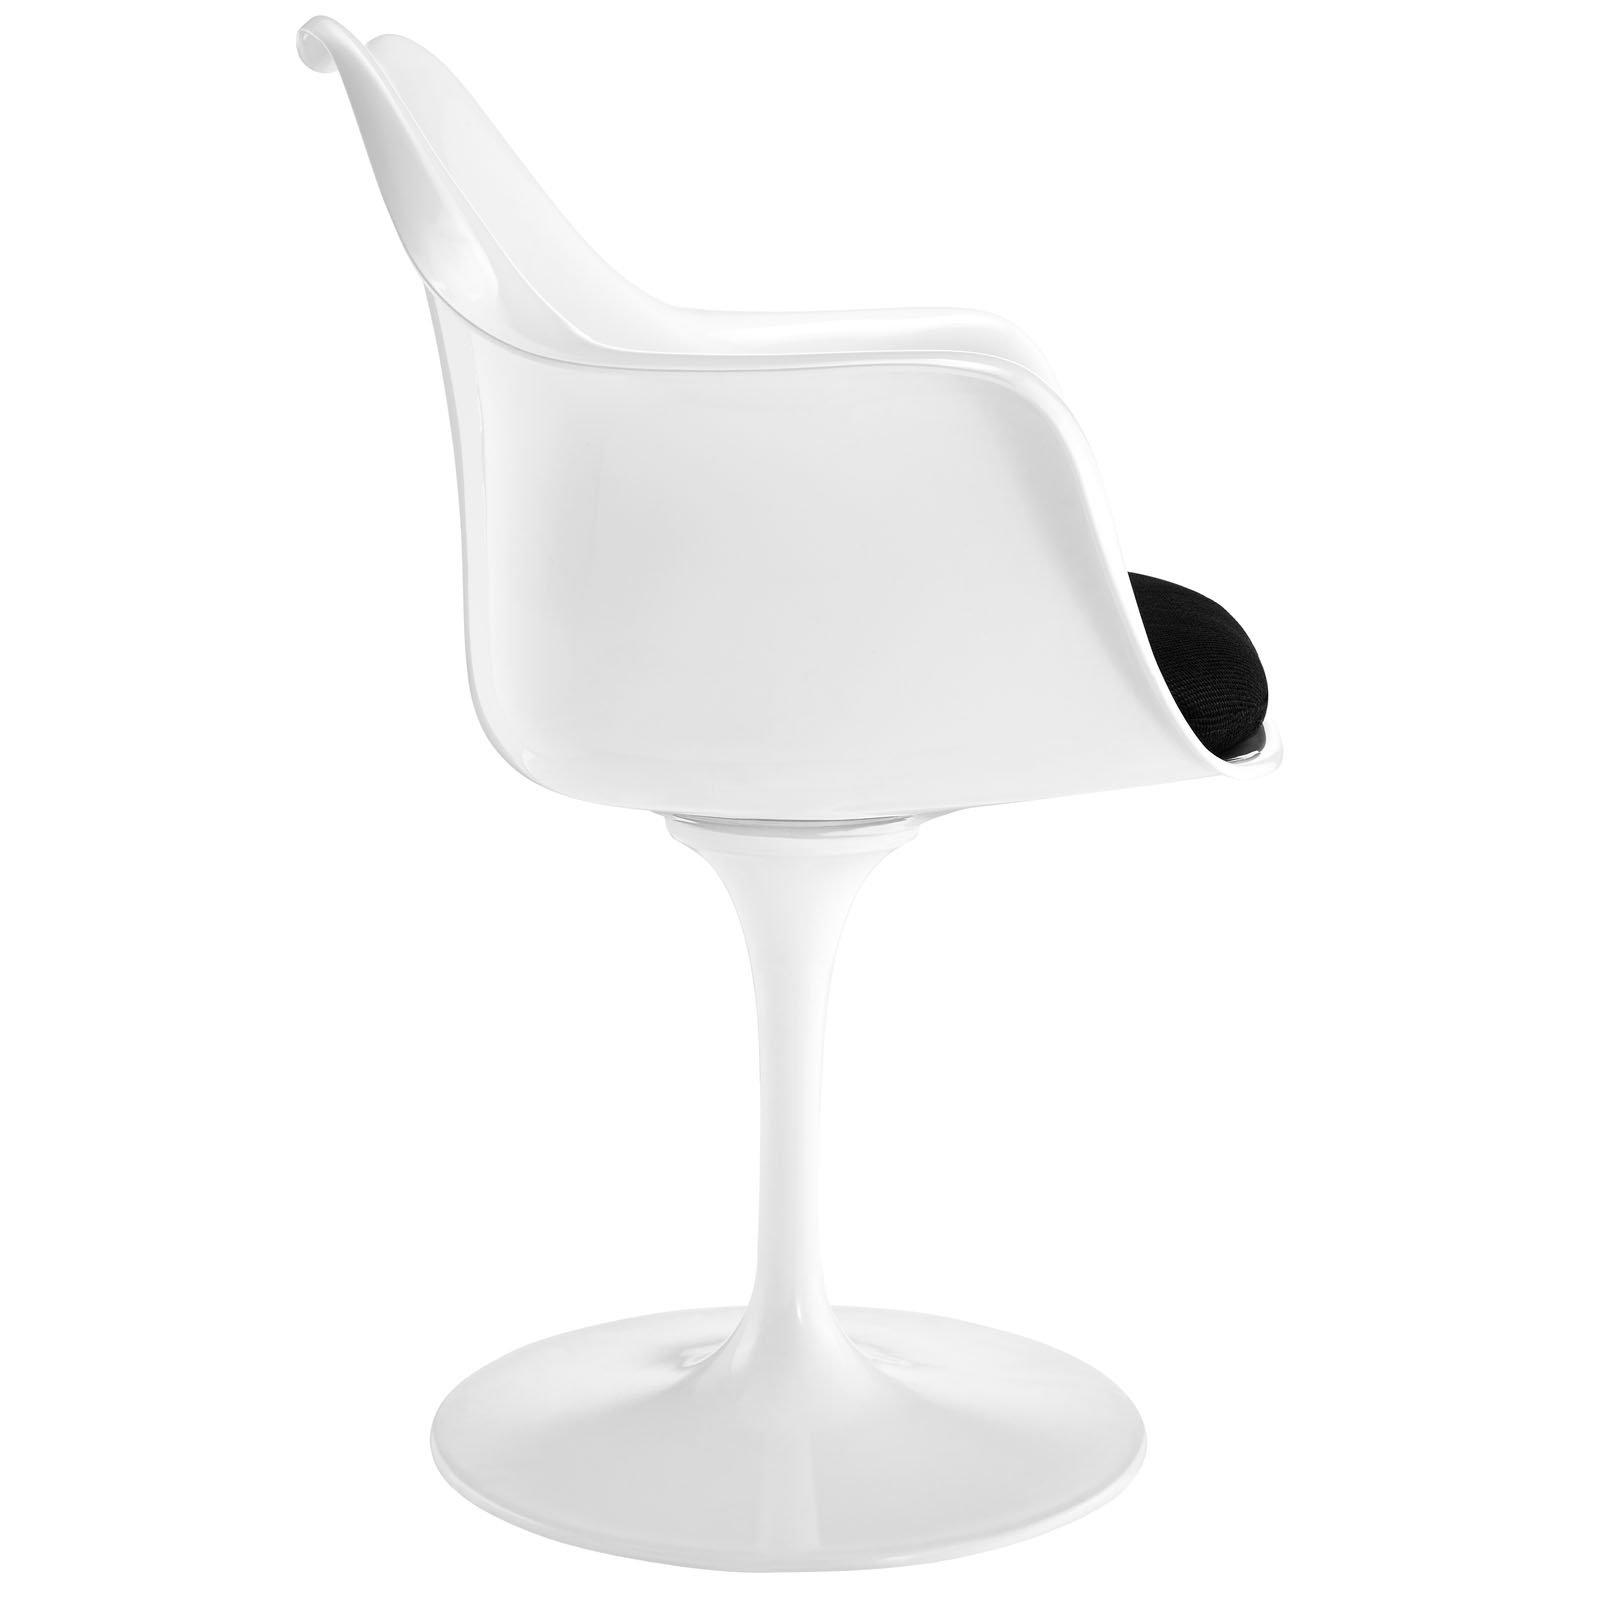 LexMod Eero Saarinen Style Tulip Armchair with Black Cushion